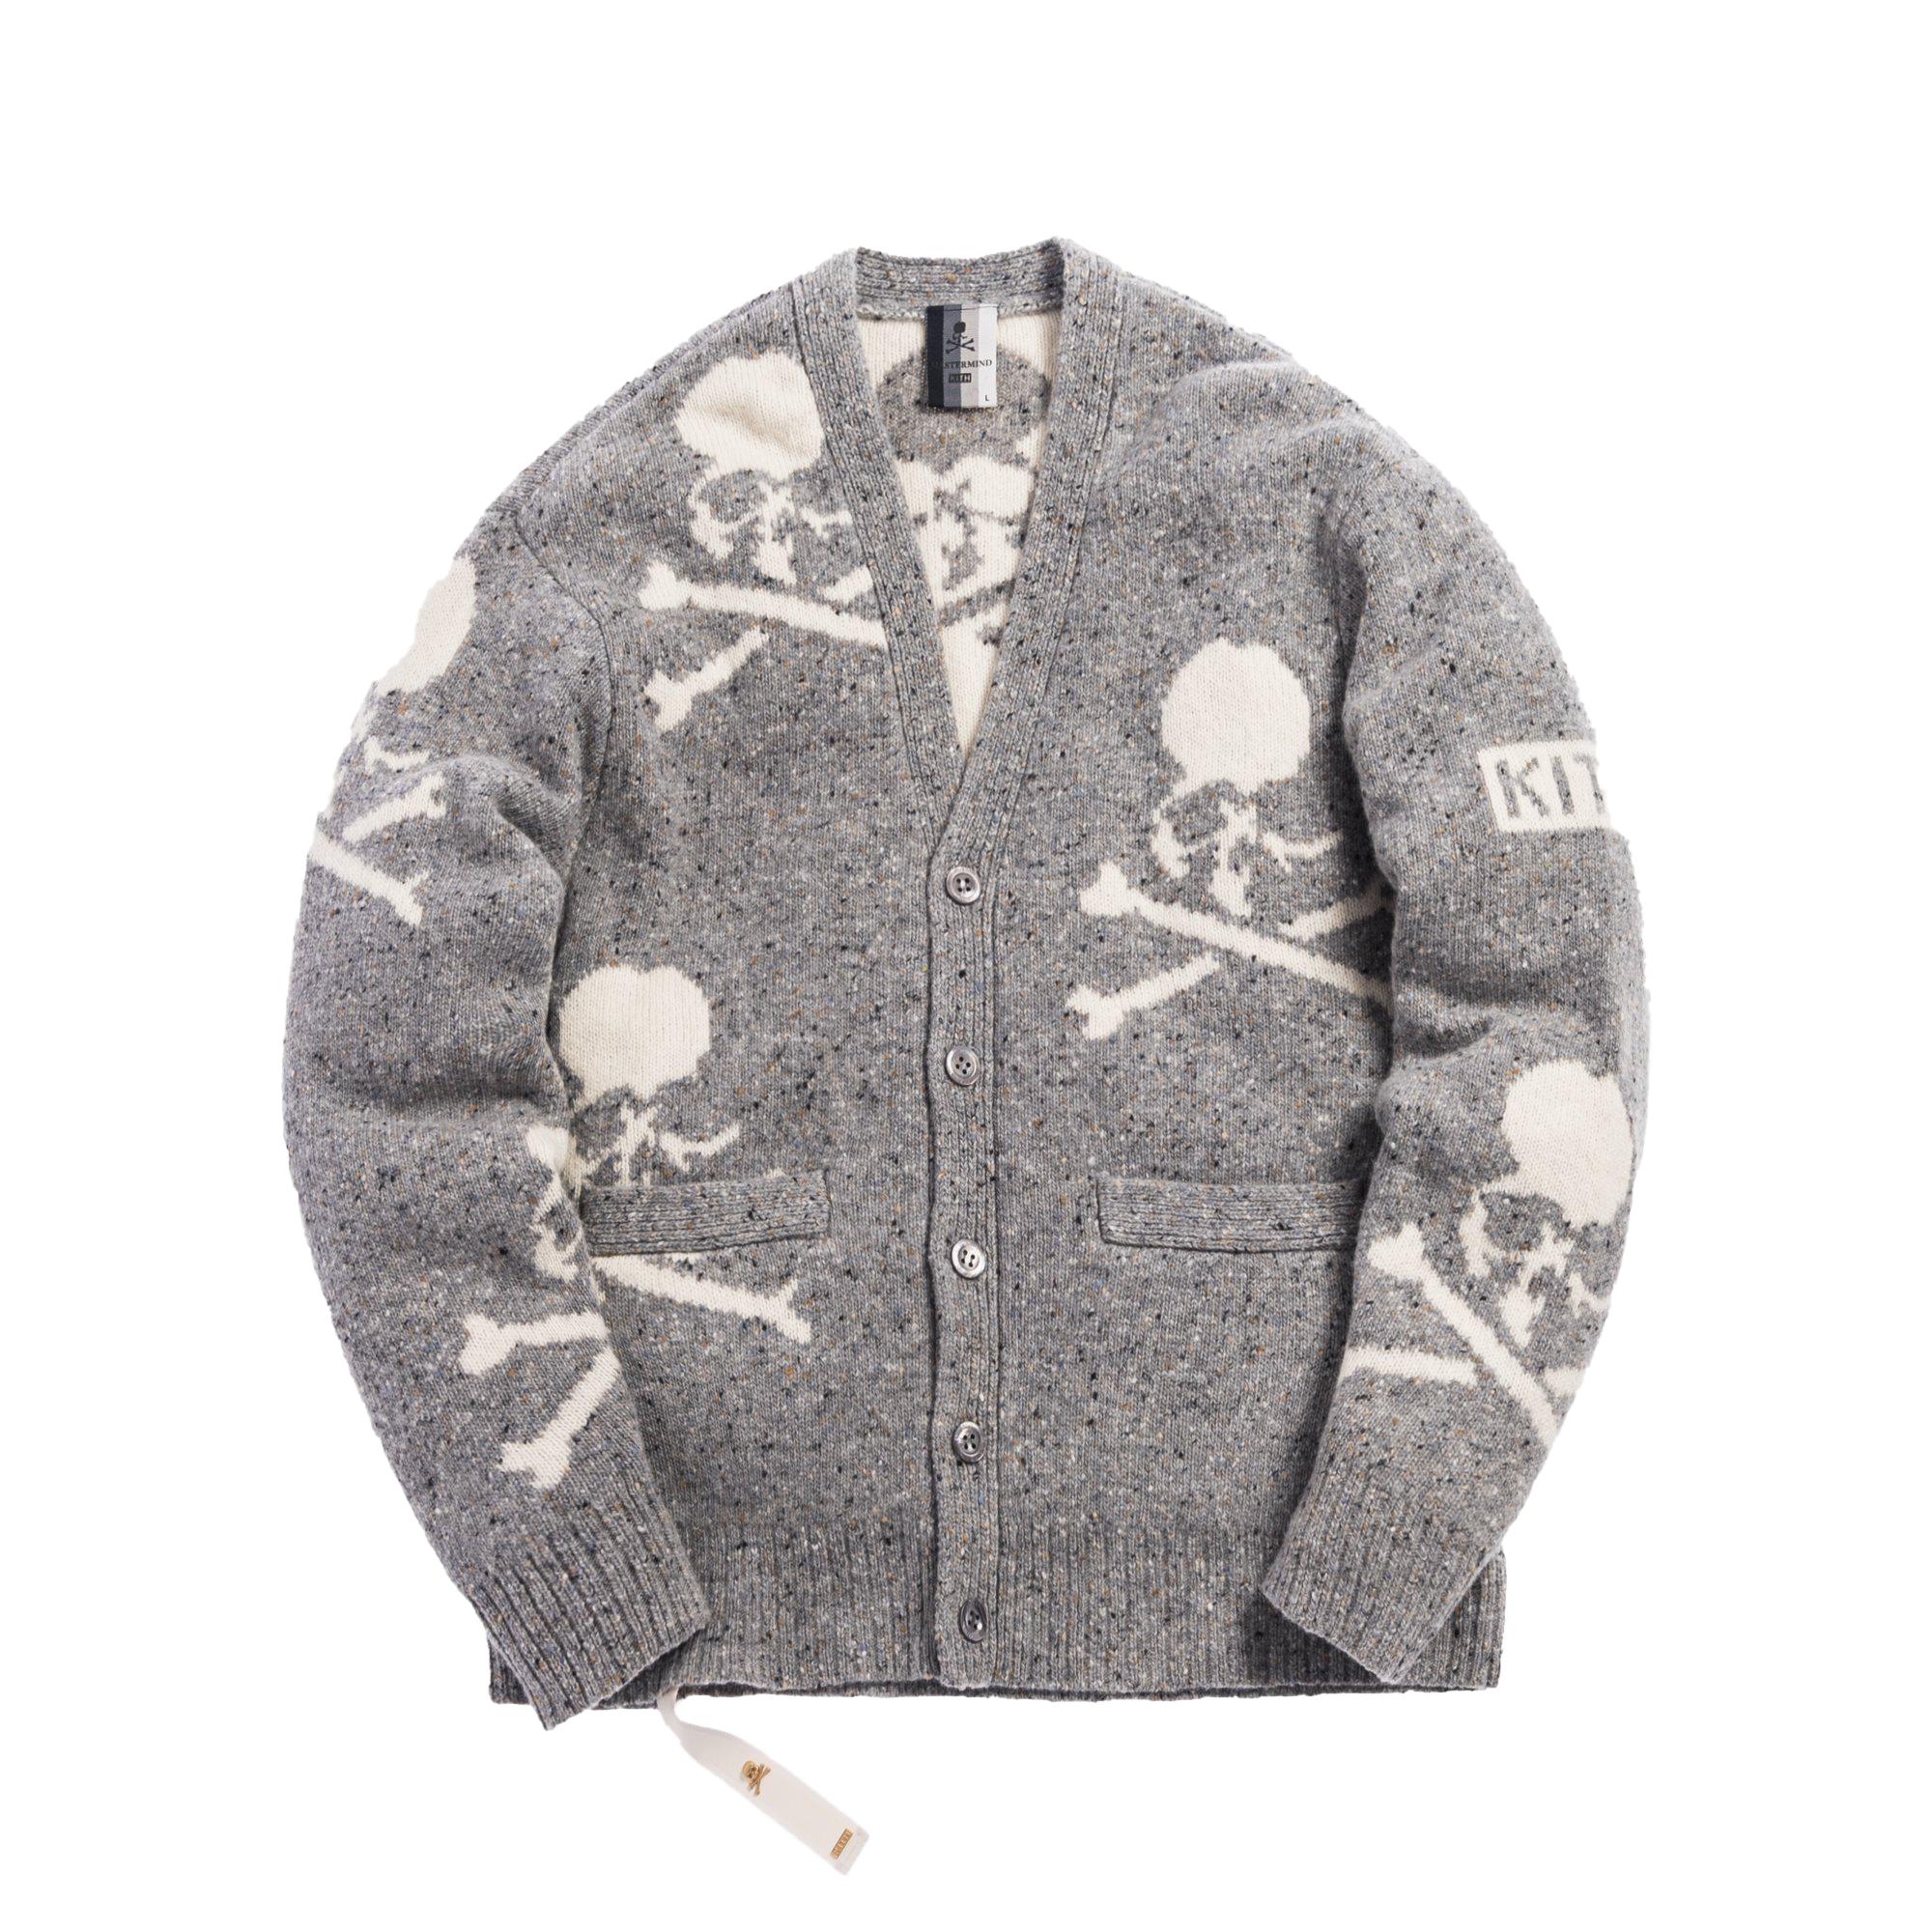 Kith x mastermind WORLD Knit Cardigan Turtle Dove